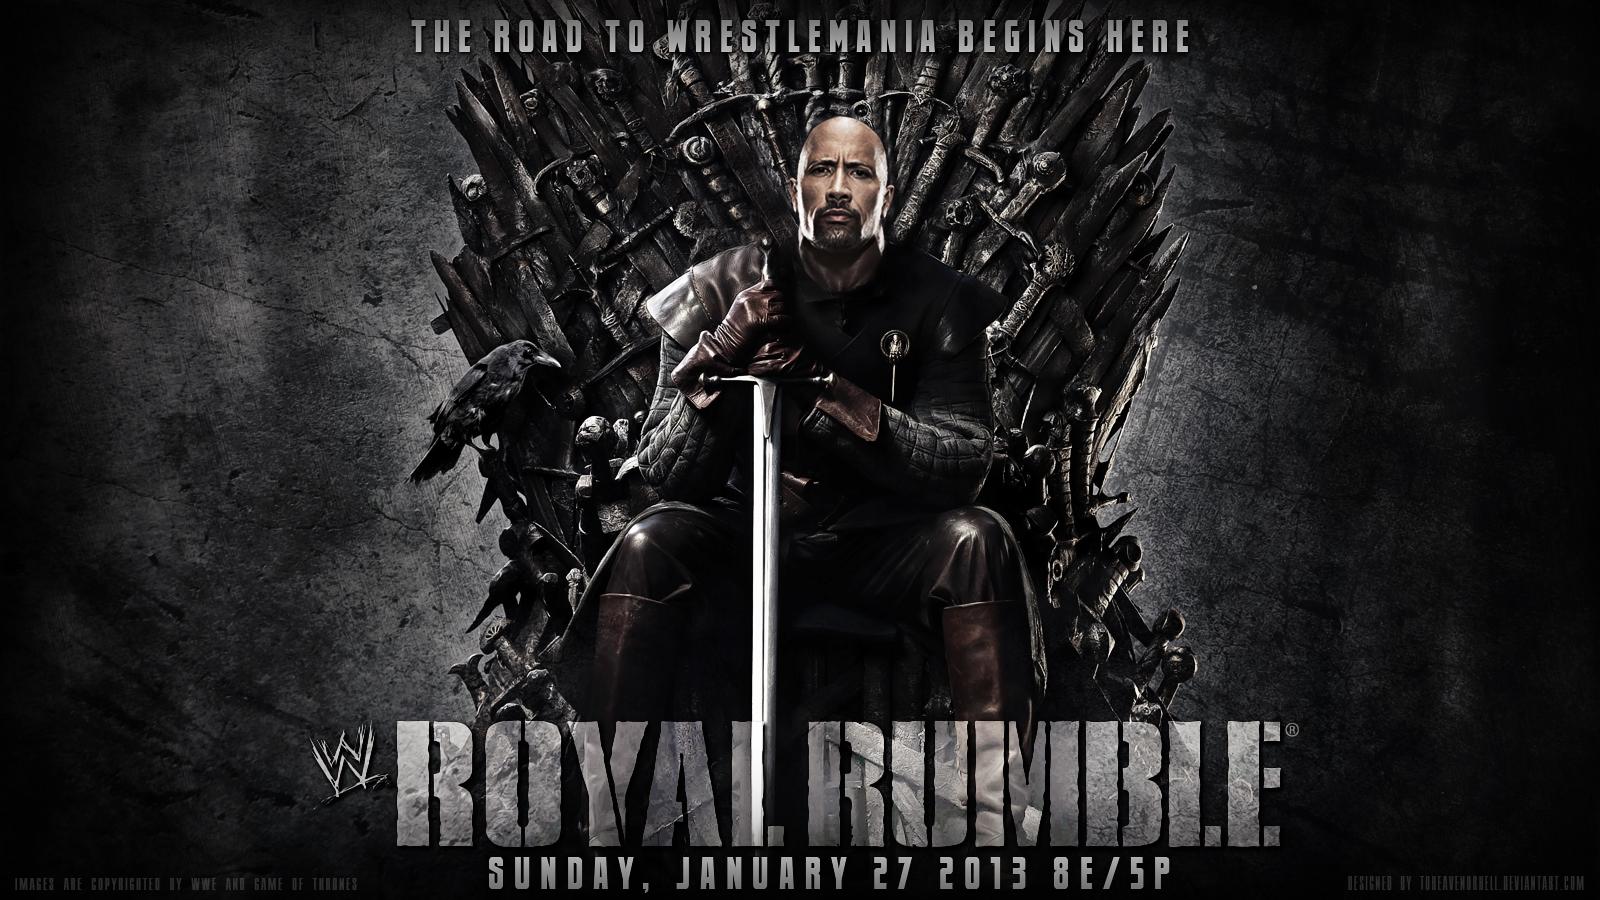 WWE Royal Rumble 2013 Wallpaper The Rock